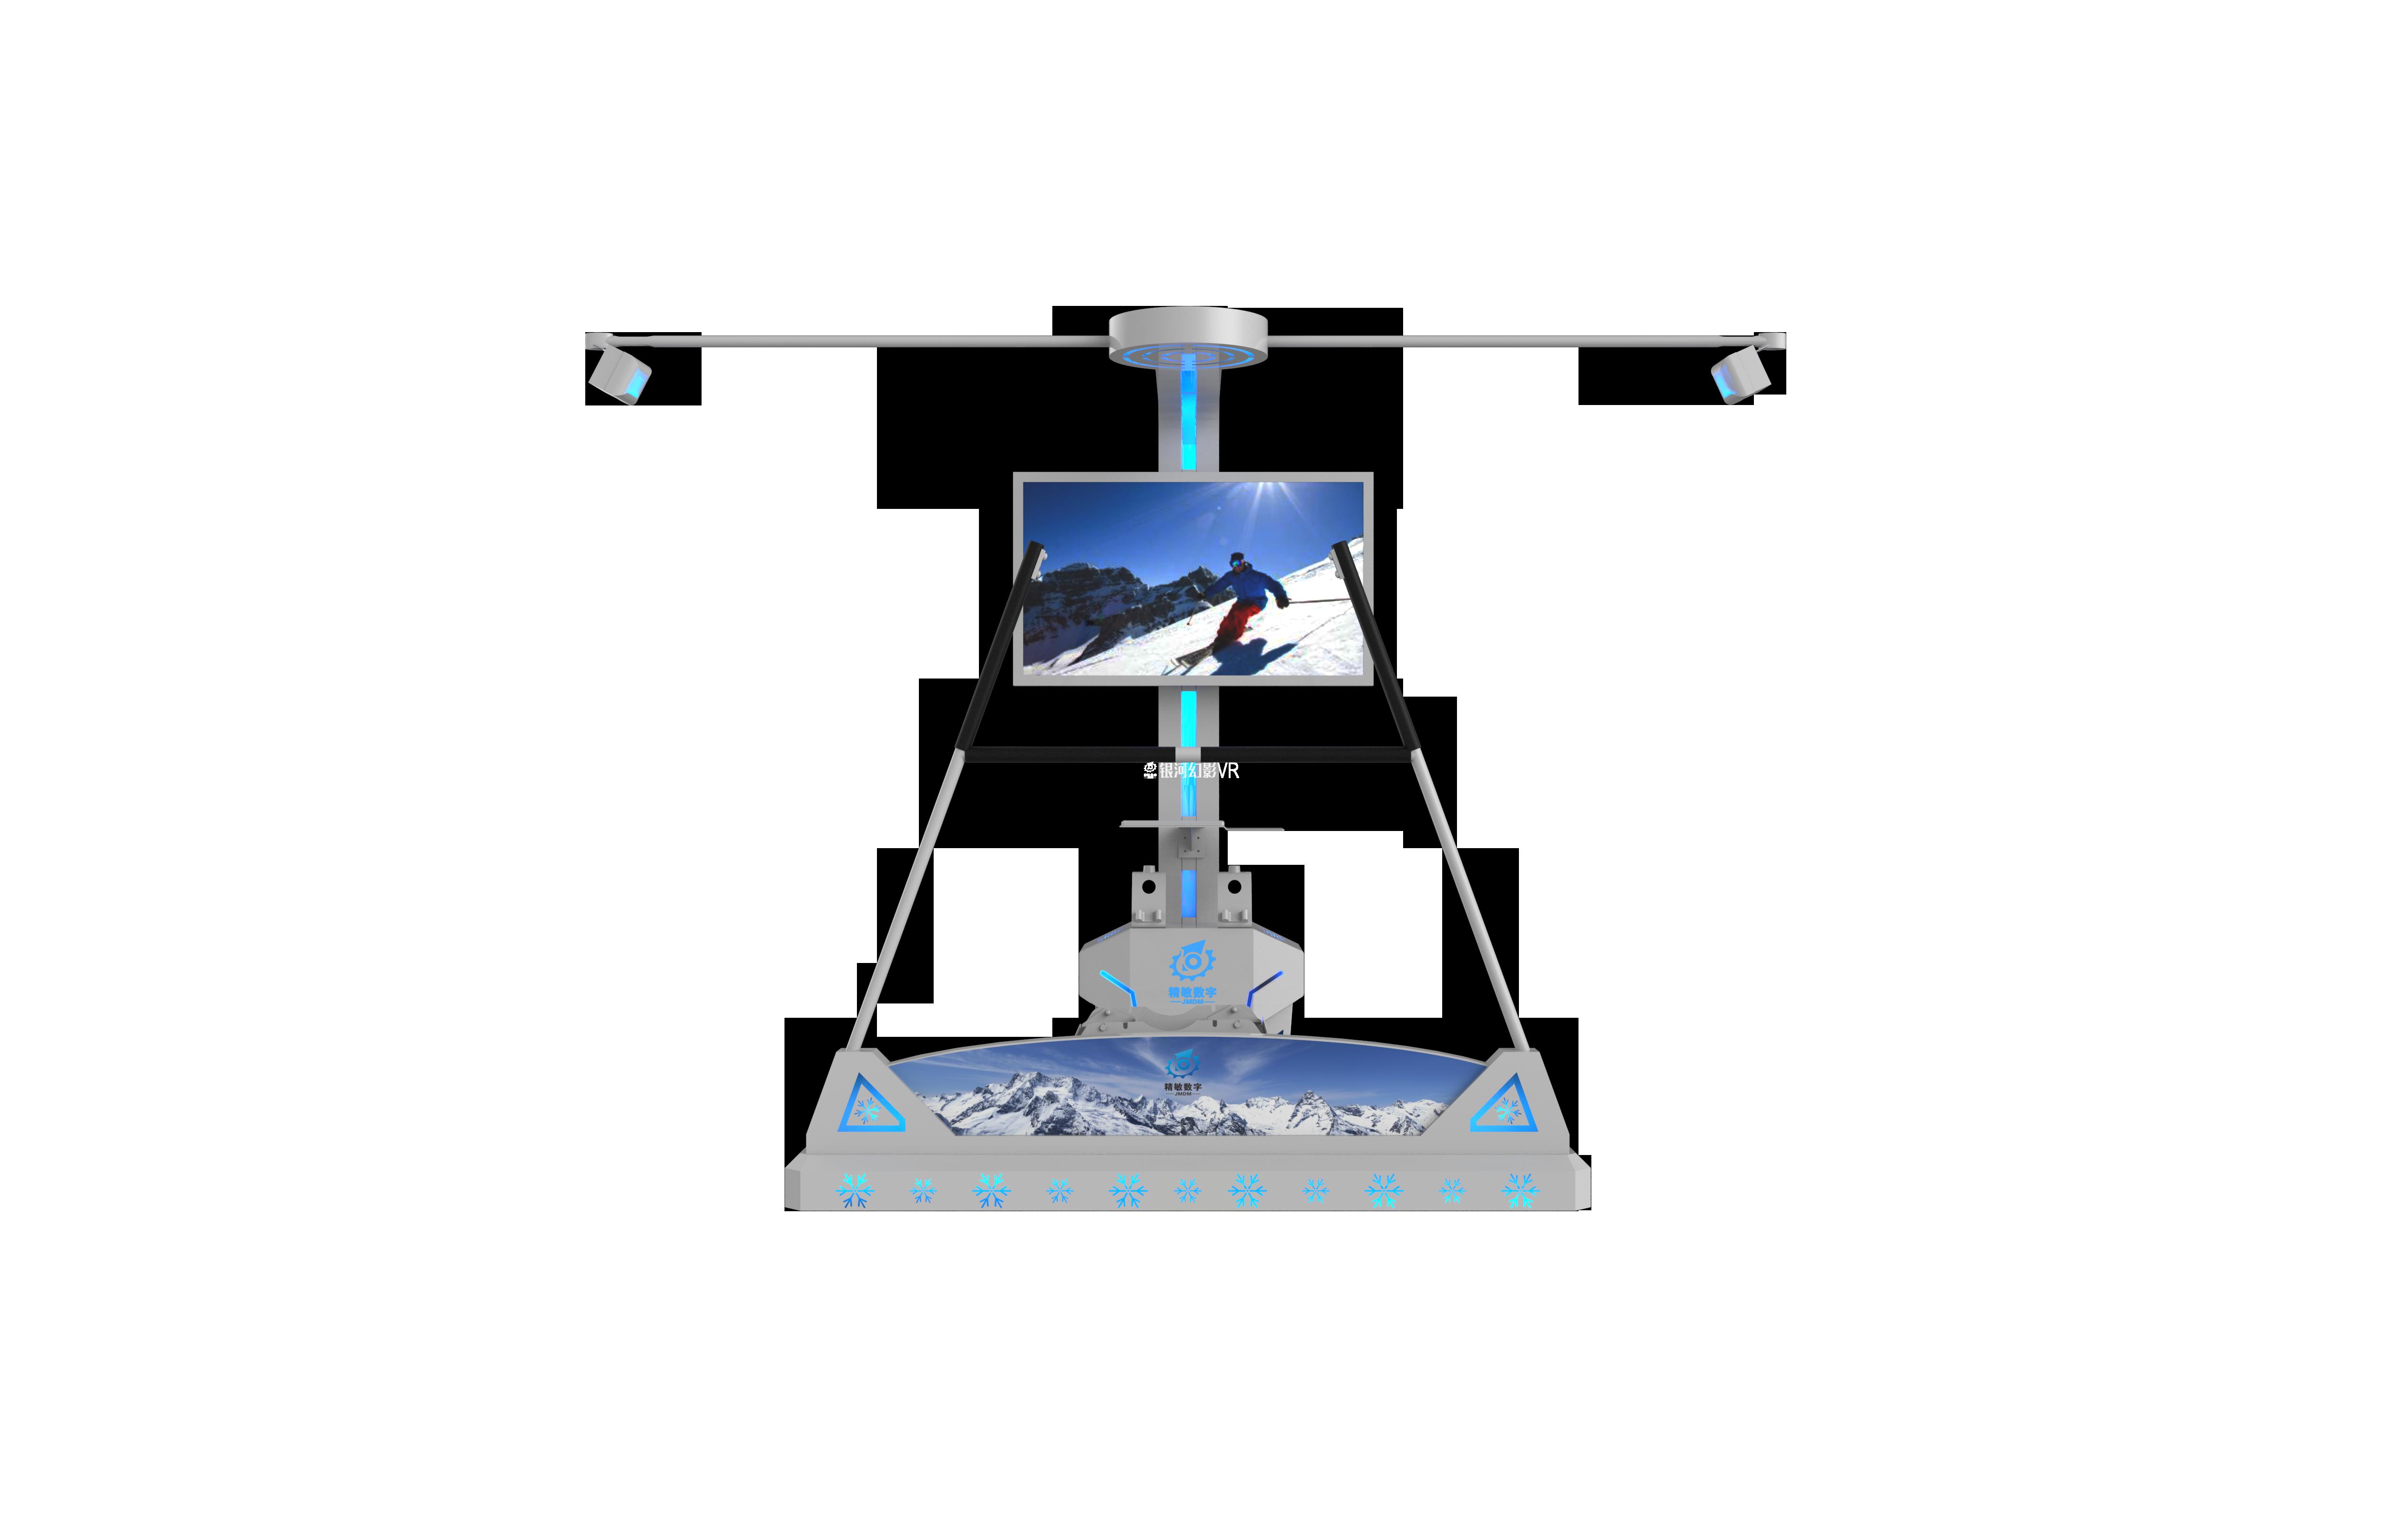 VR極限運動—滑雪模擬器